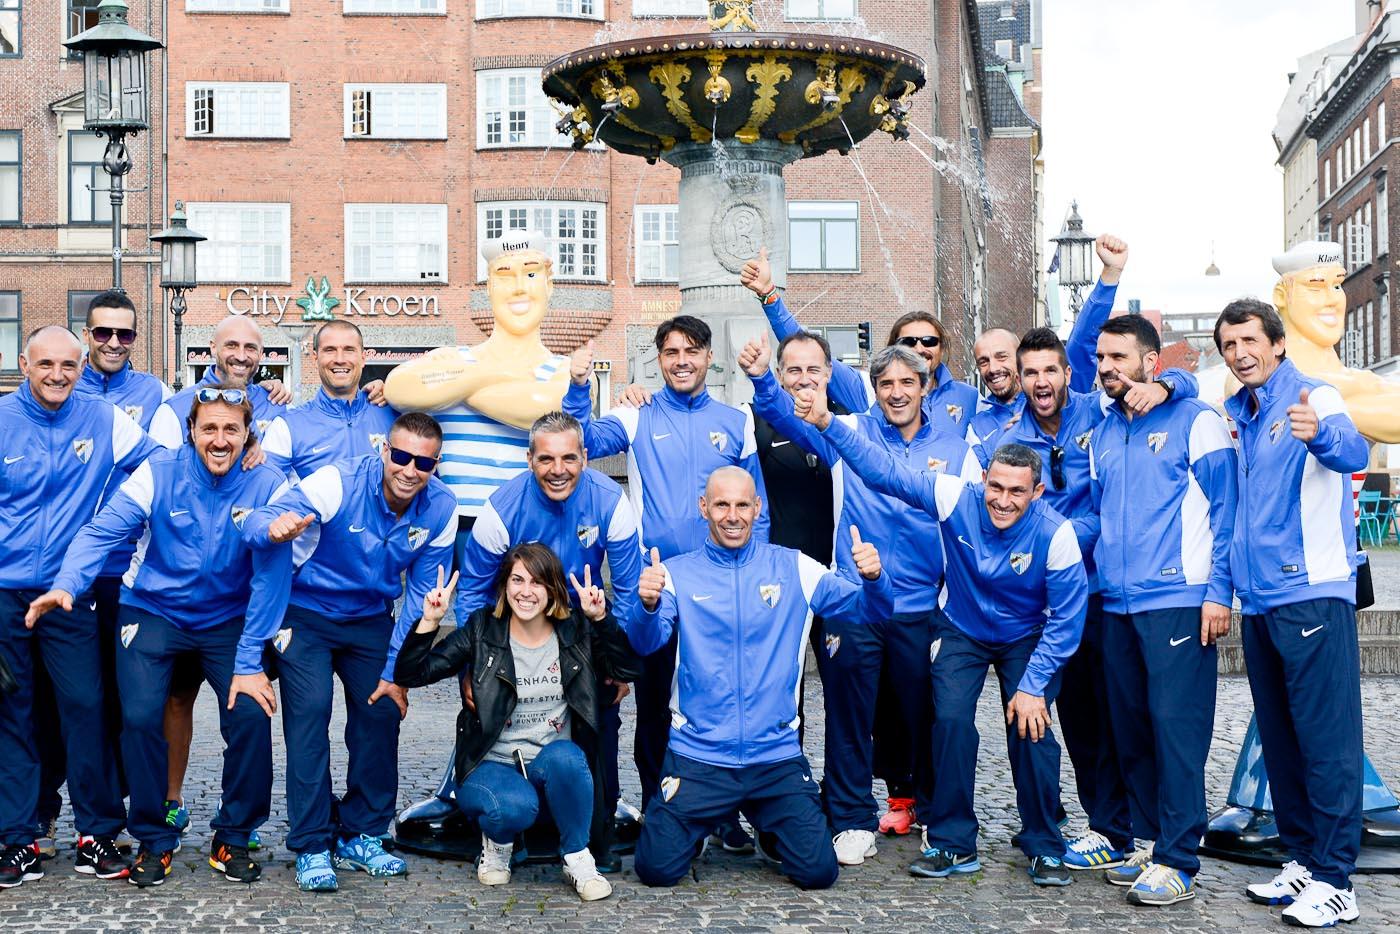 Foto ID 150922013 Málaga Football Club, Hamburg on Tour, Kopenhagen